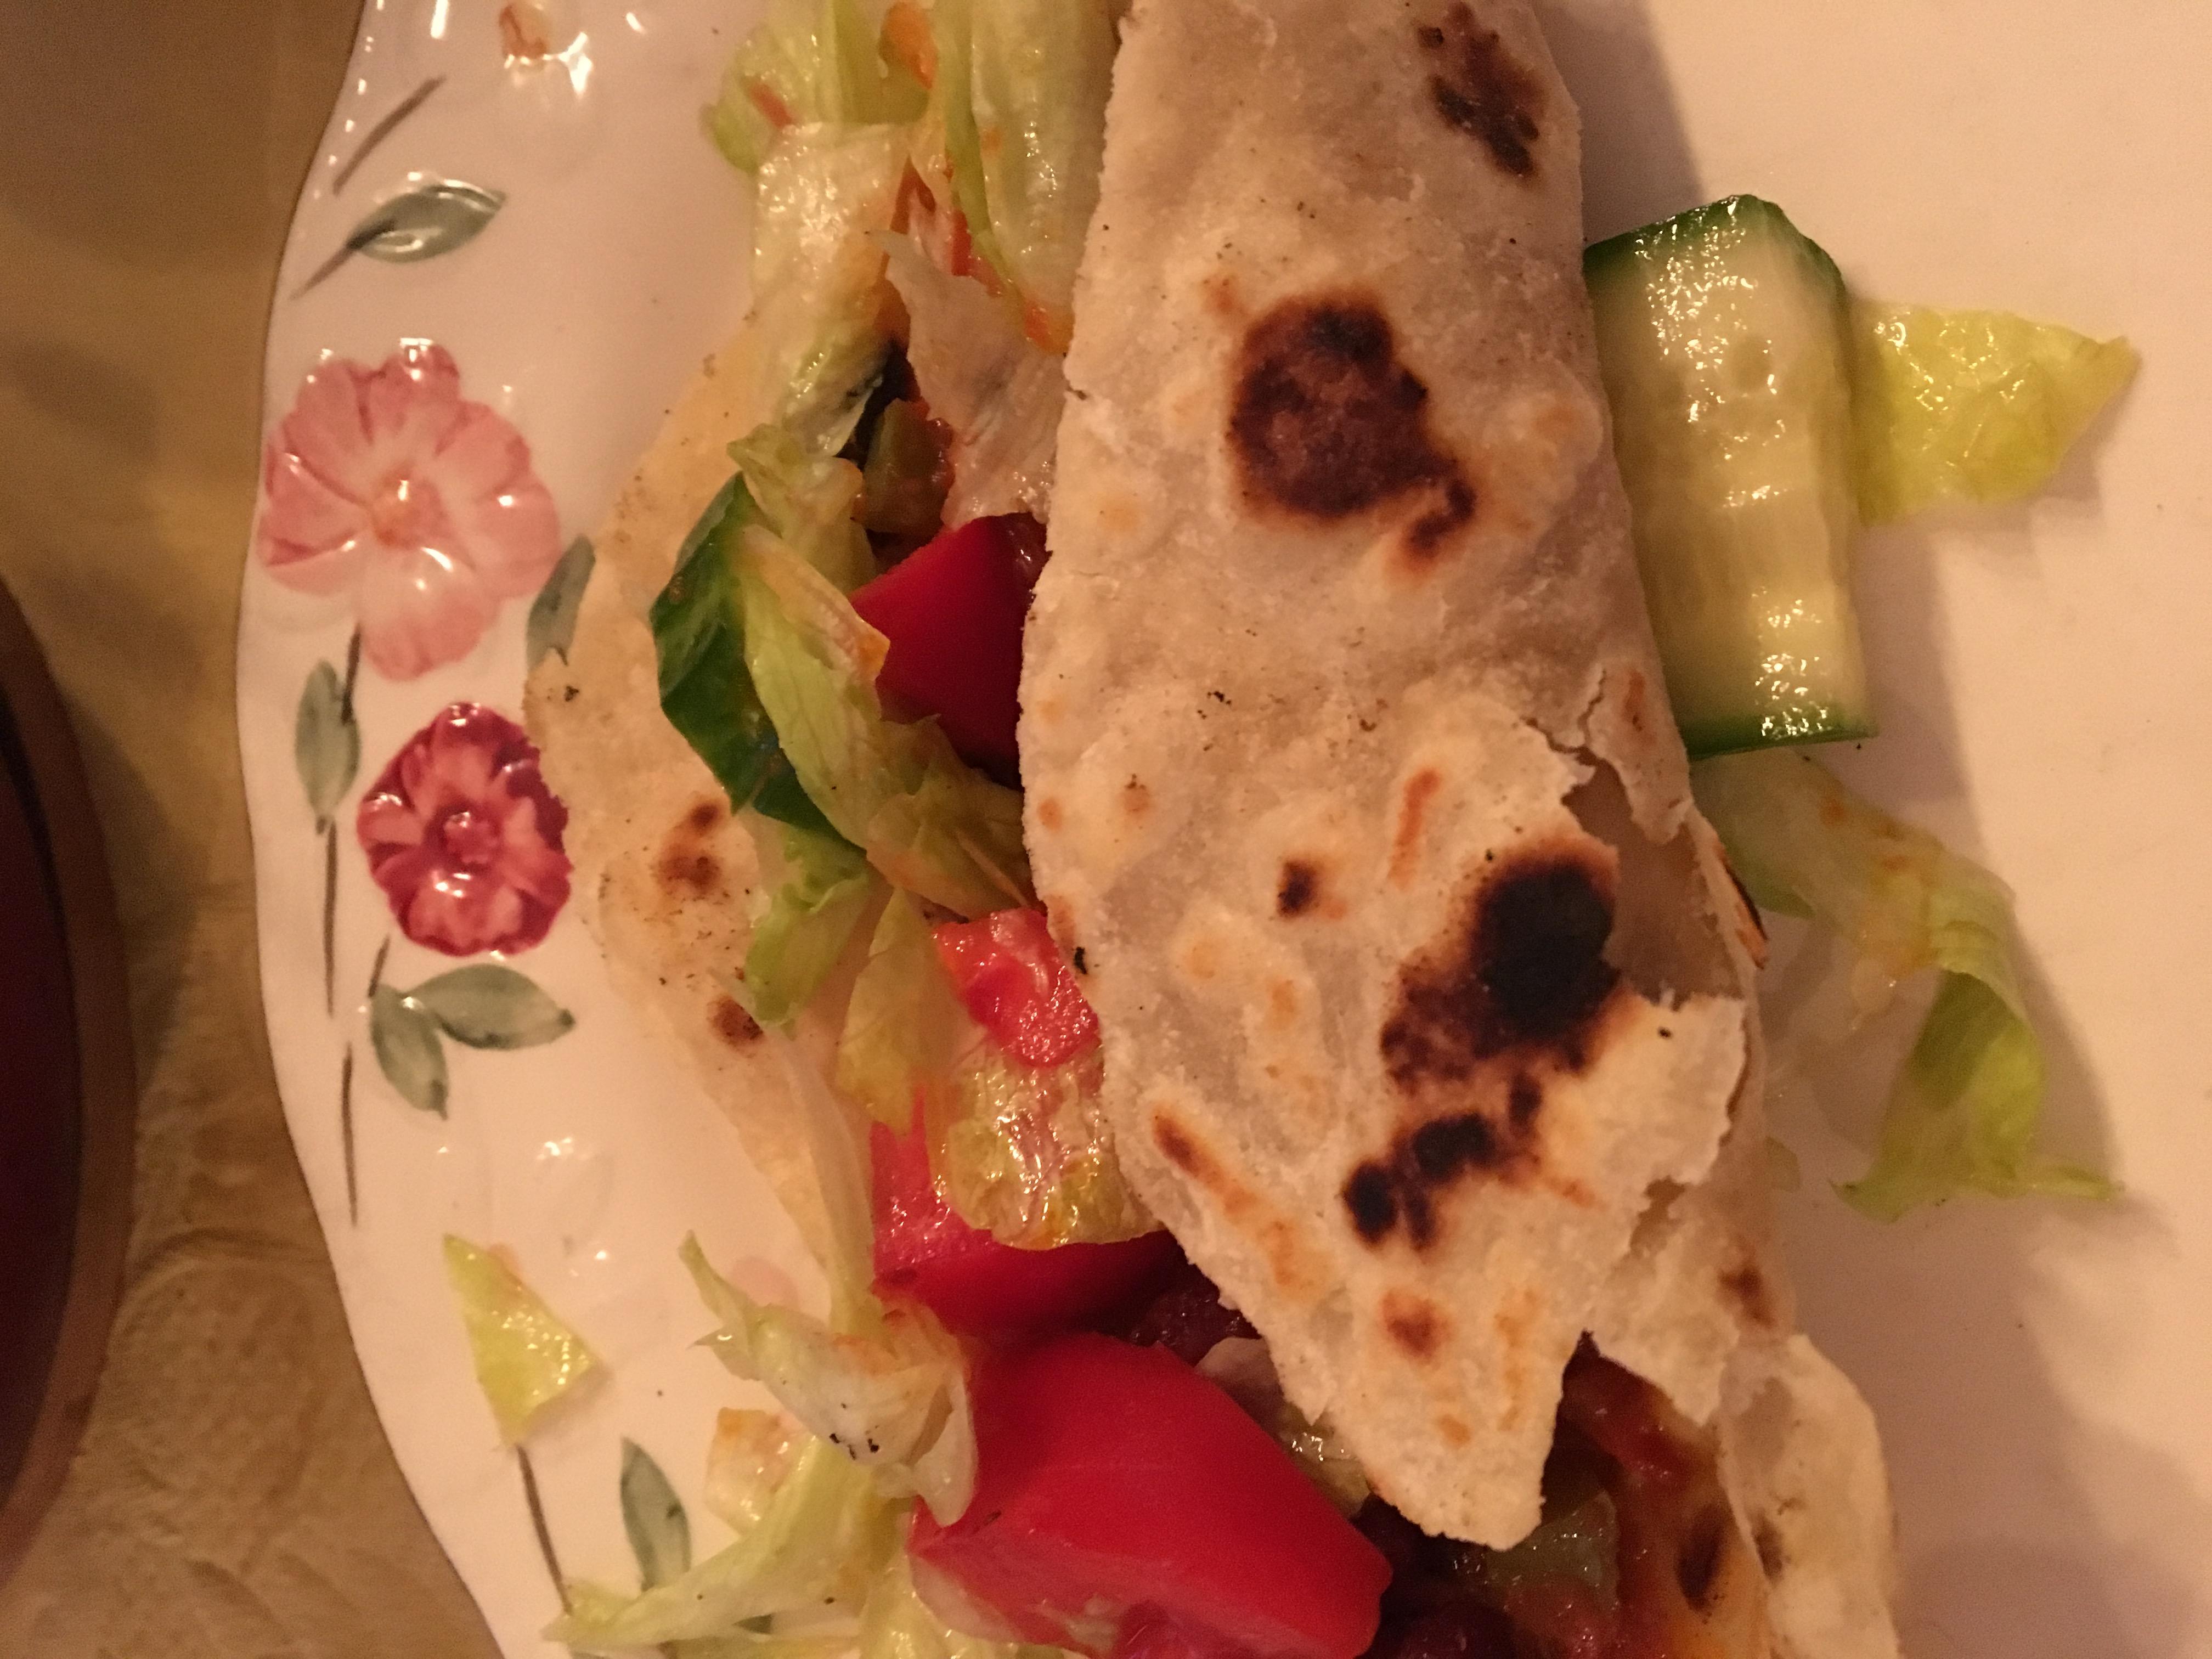 Home made tortillas encase Chili con beany